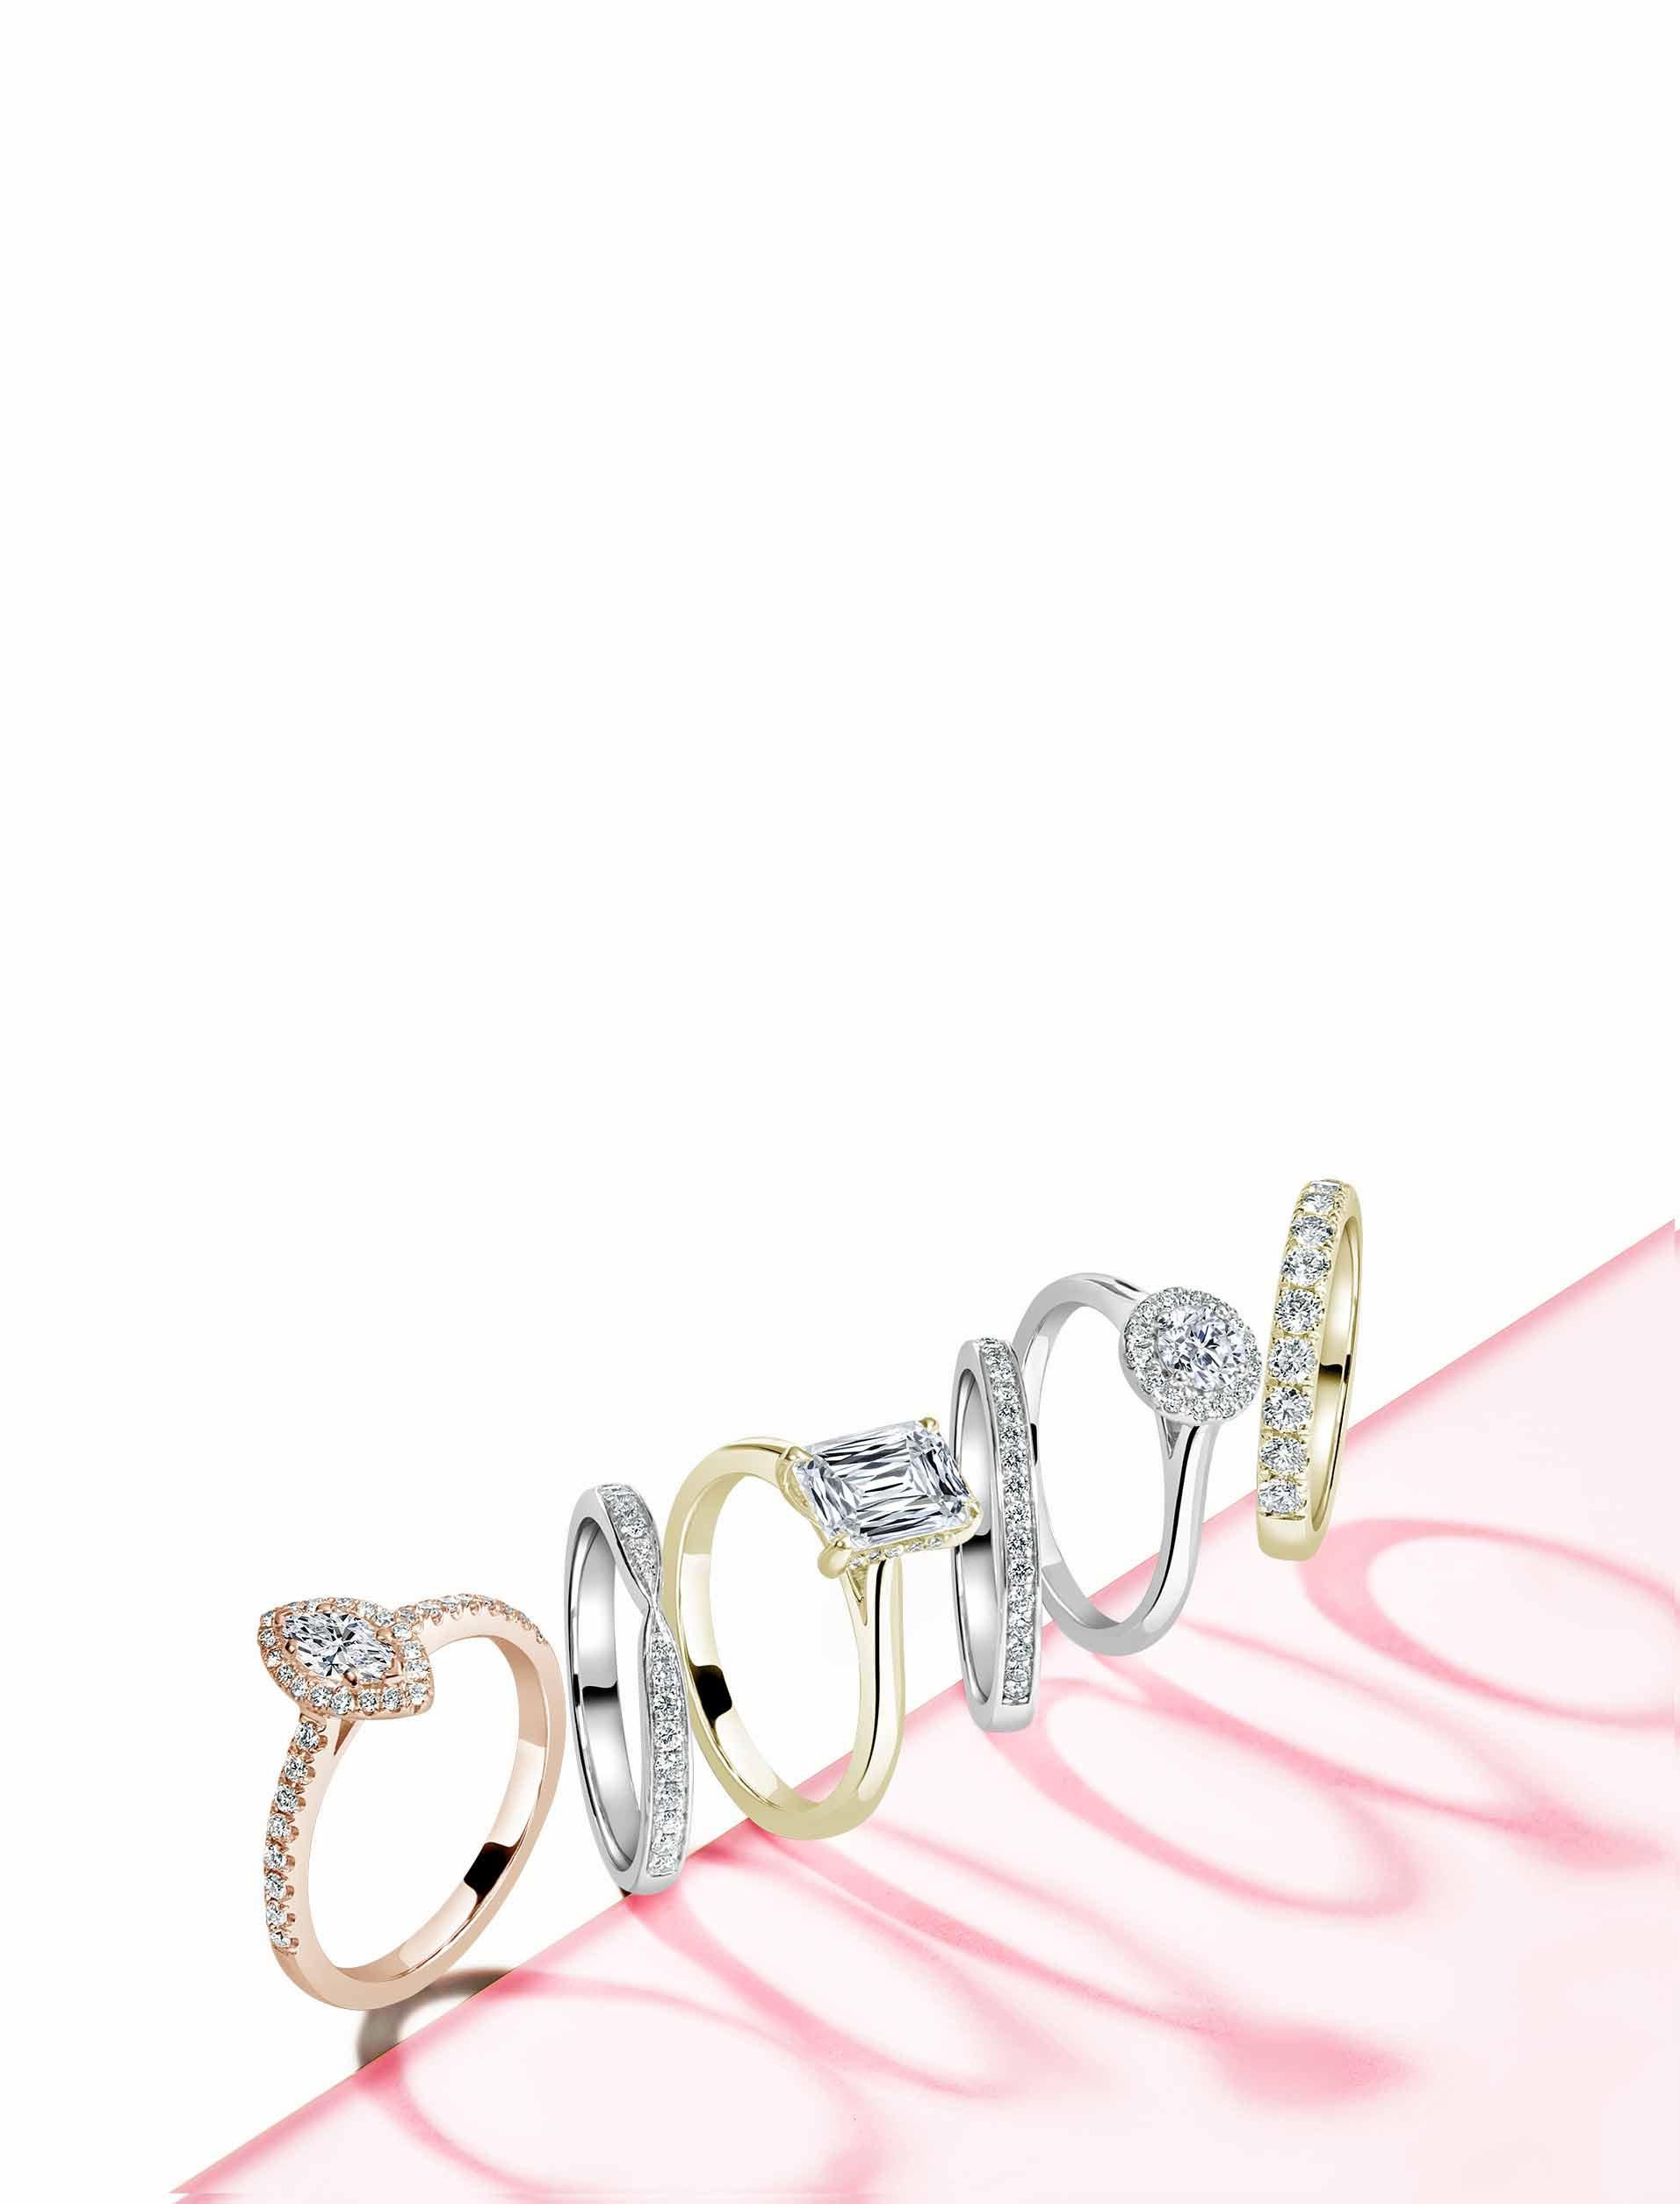 White Gold Pear Shaped Engagement Rings - Steven Stone